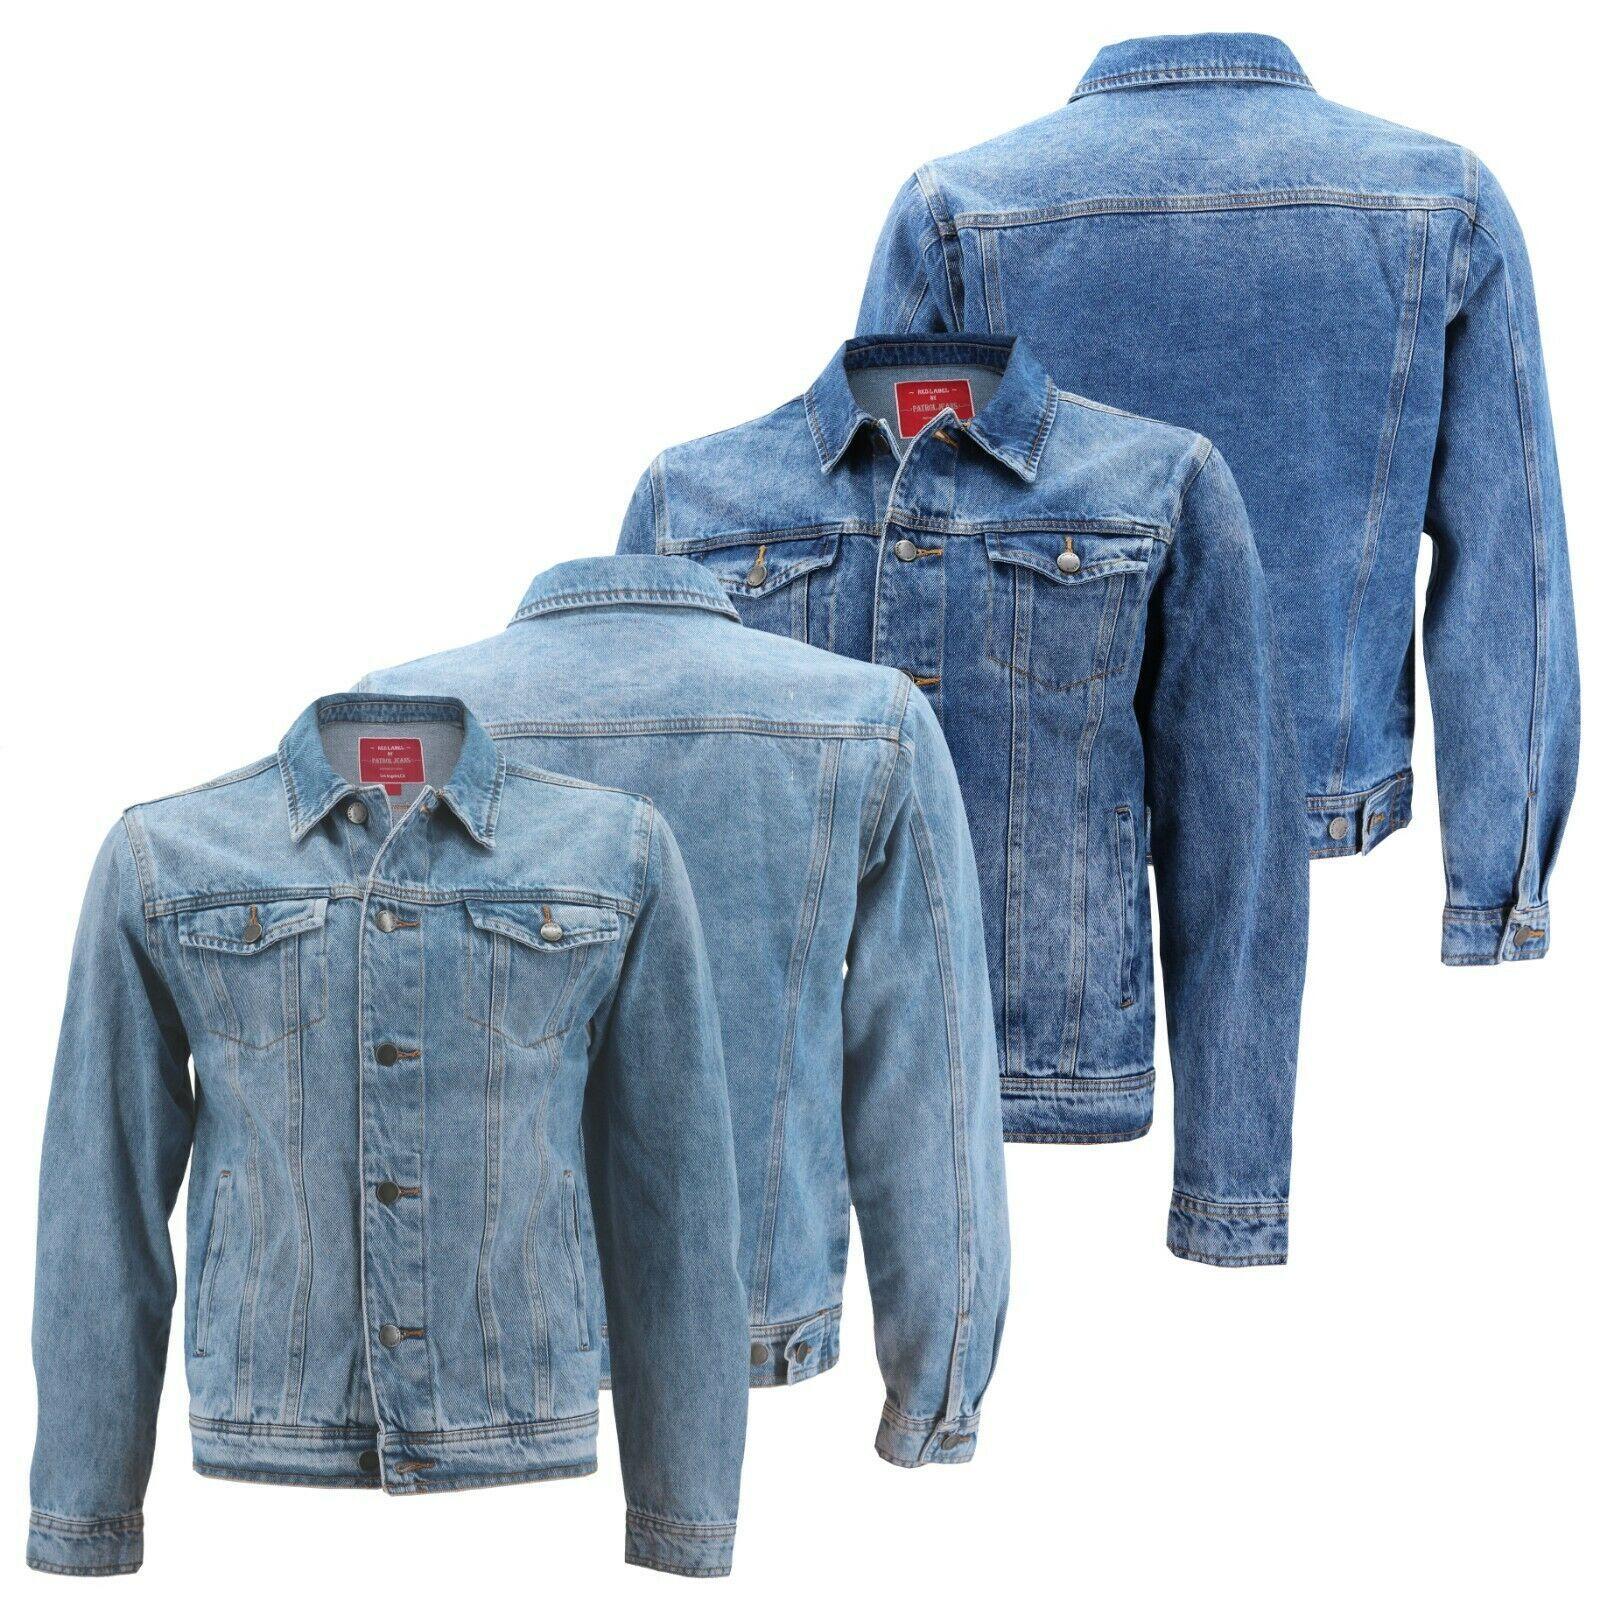 Red Label Men's Premium Casual Faded Denim Jean Button Up Cotton Slim Fit Jacket